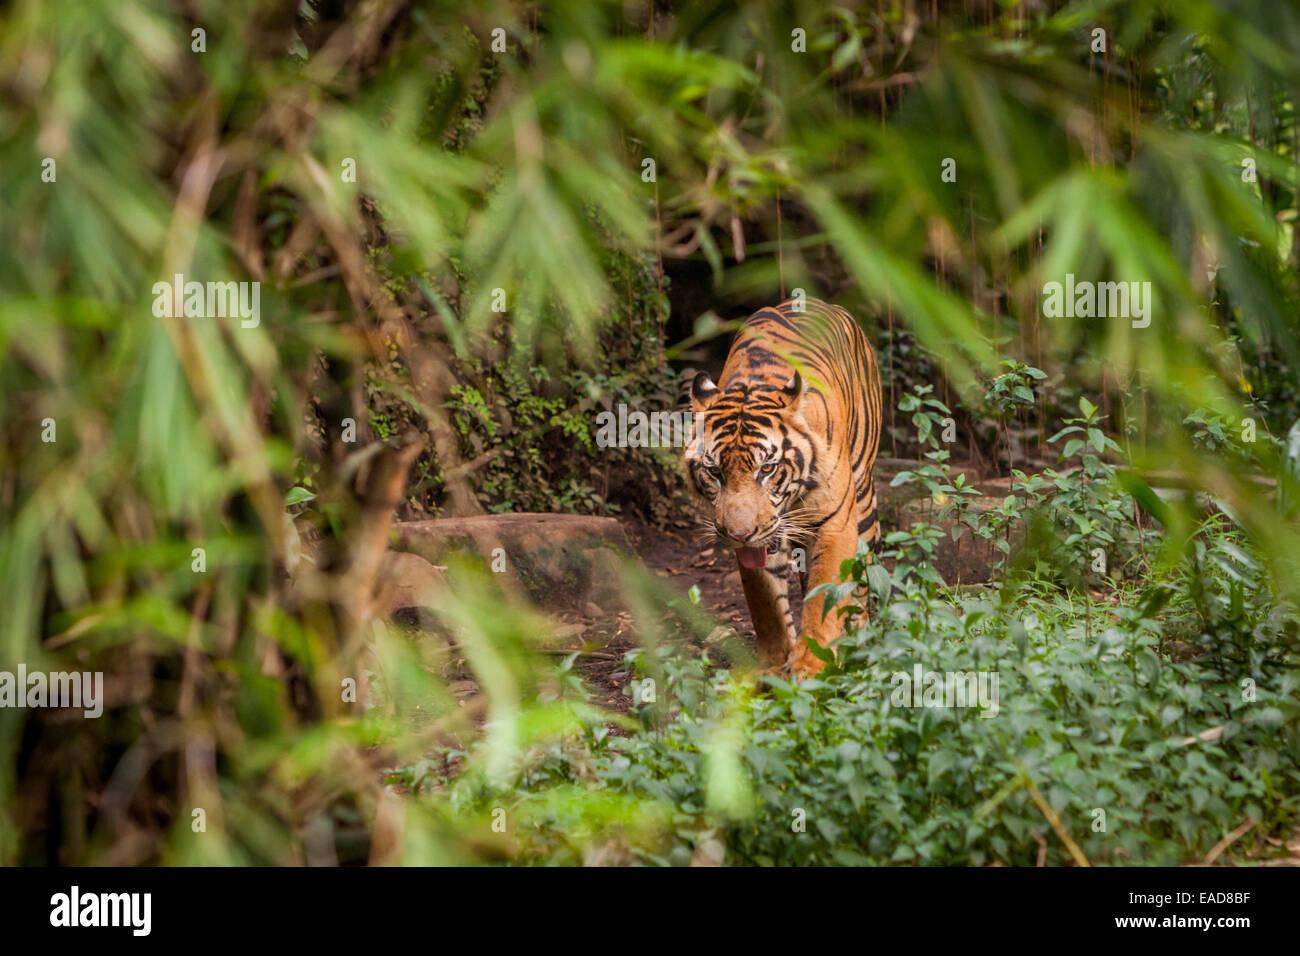 Tiger at Jakarta Zoo, Jakarta, Indonesia. - Stock Image